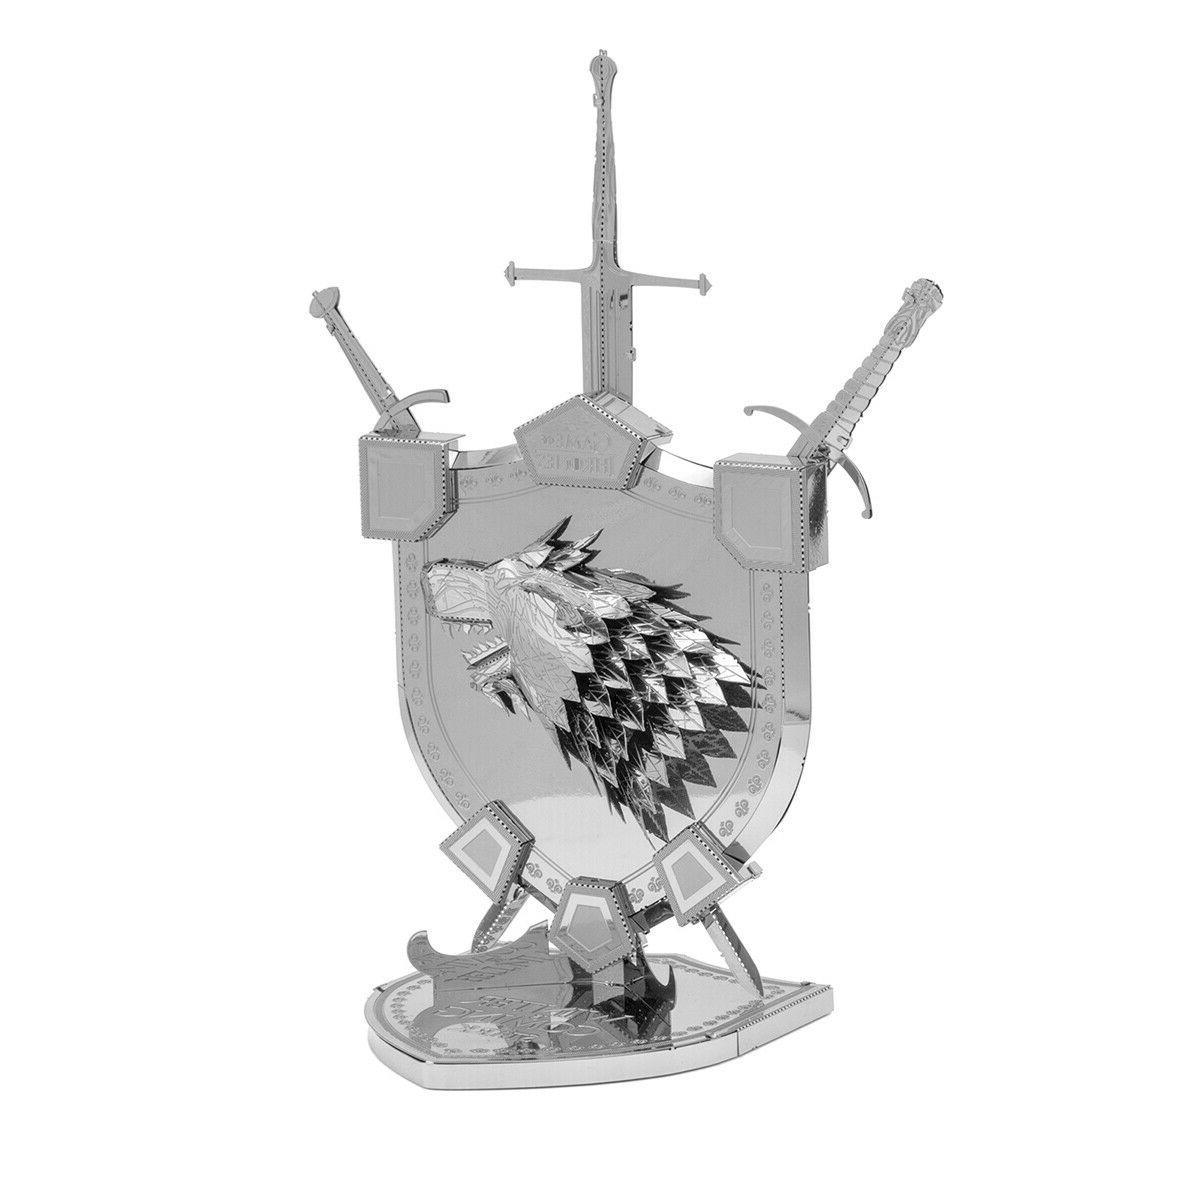 Fascinations ICONX Thrones HOUSE STARK SIGIL 3D Metal Kit